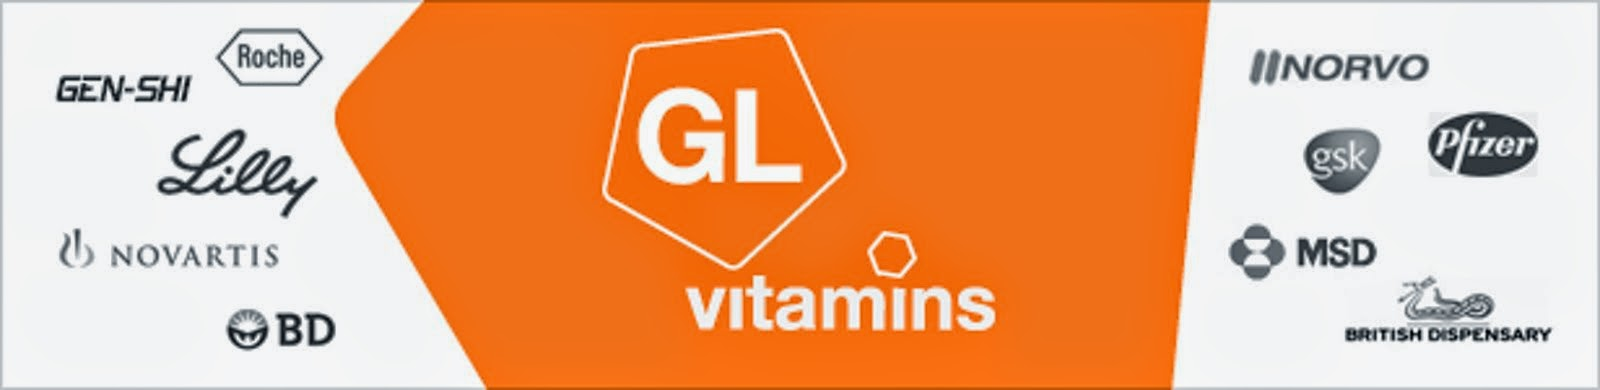 GLvitamins